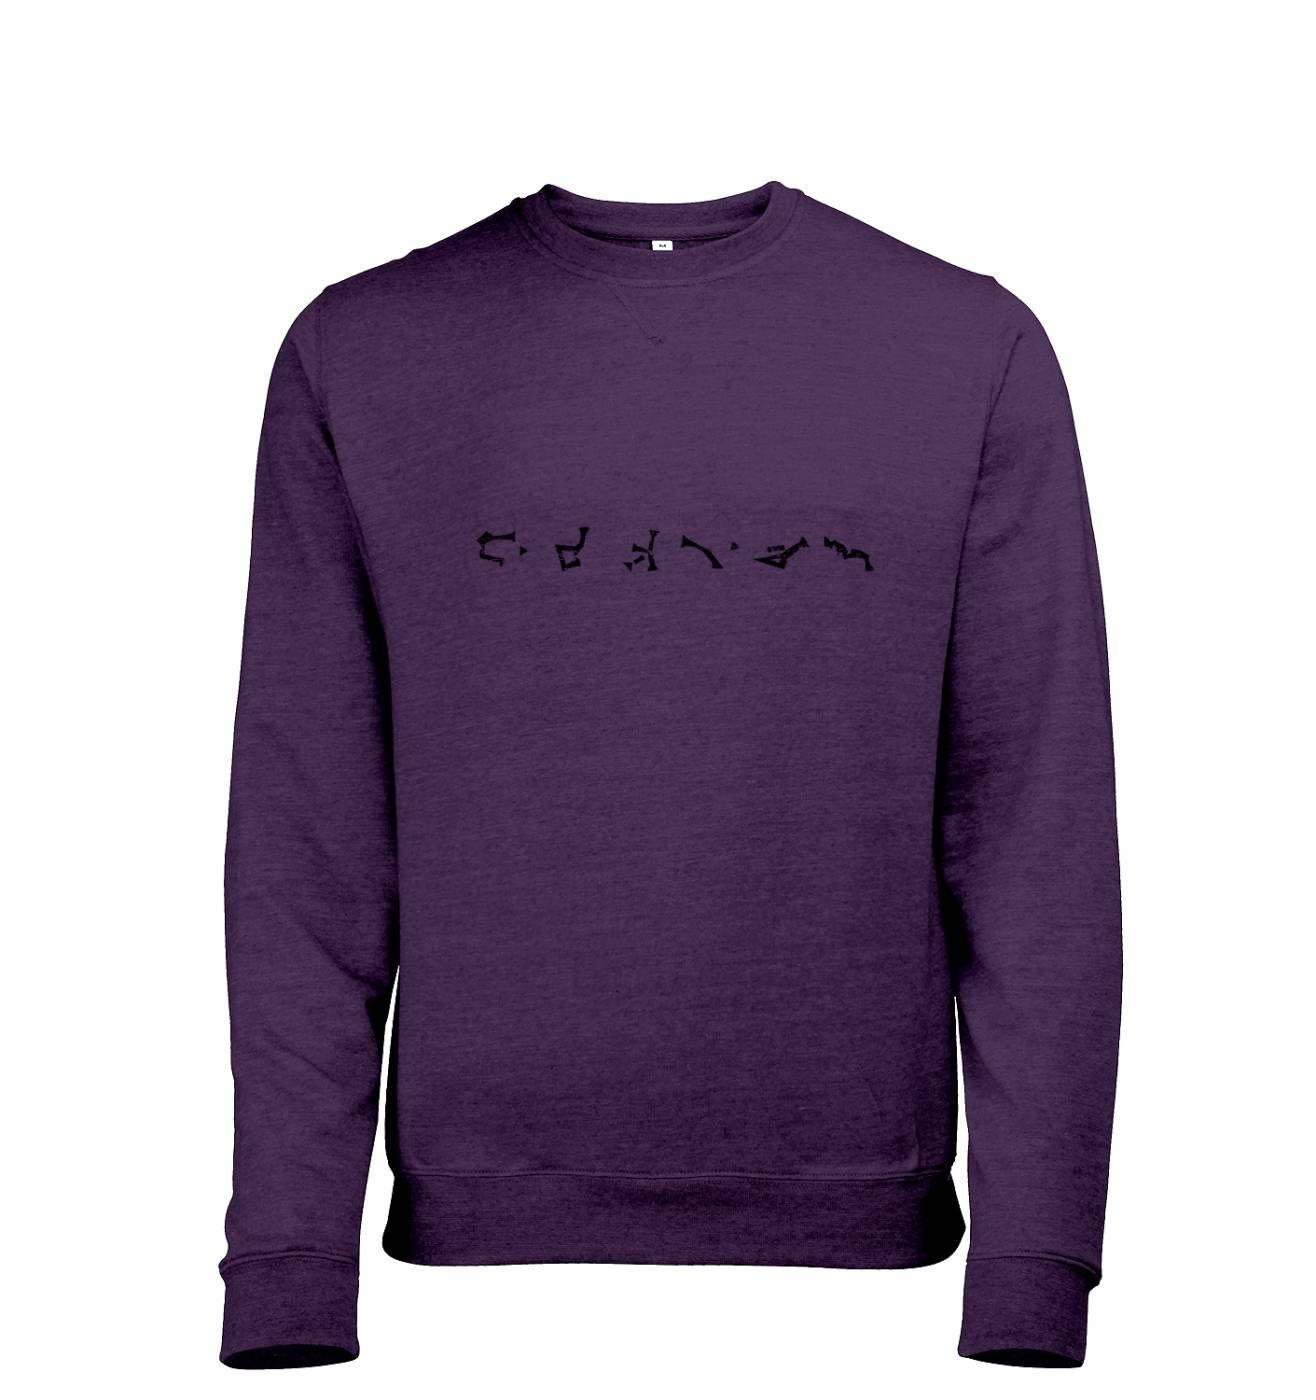 Stargate Earth Address heather sweatshirt